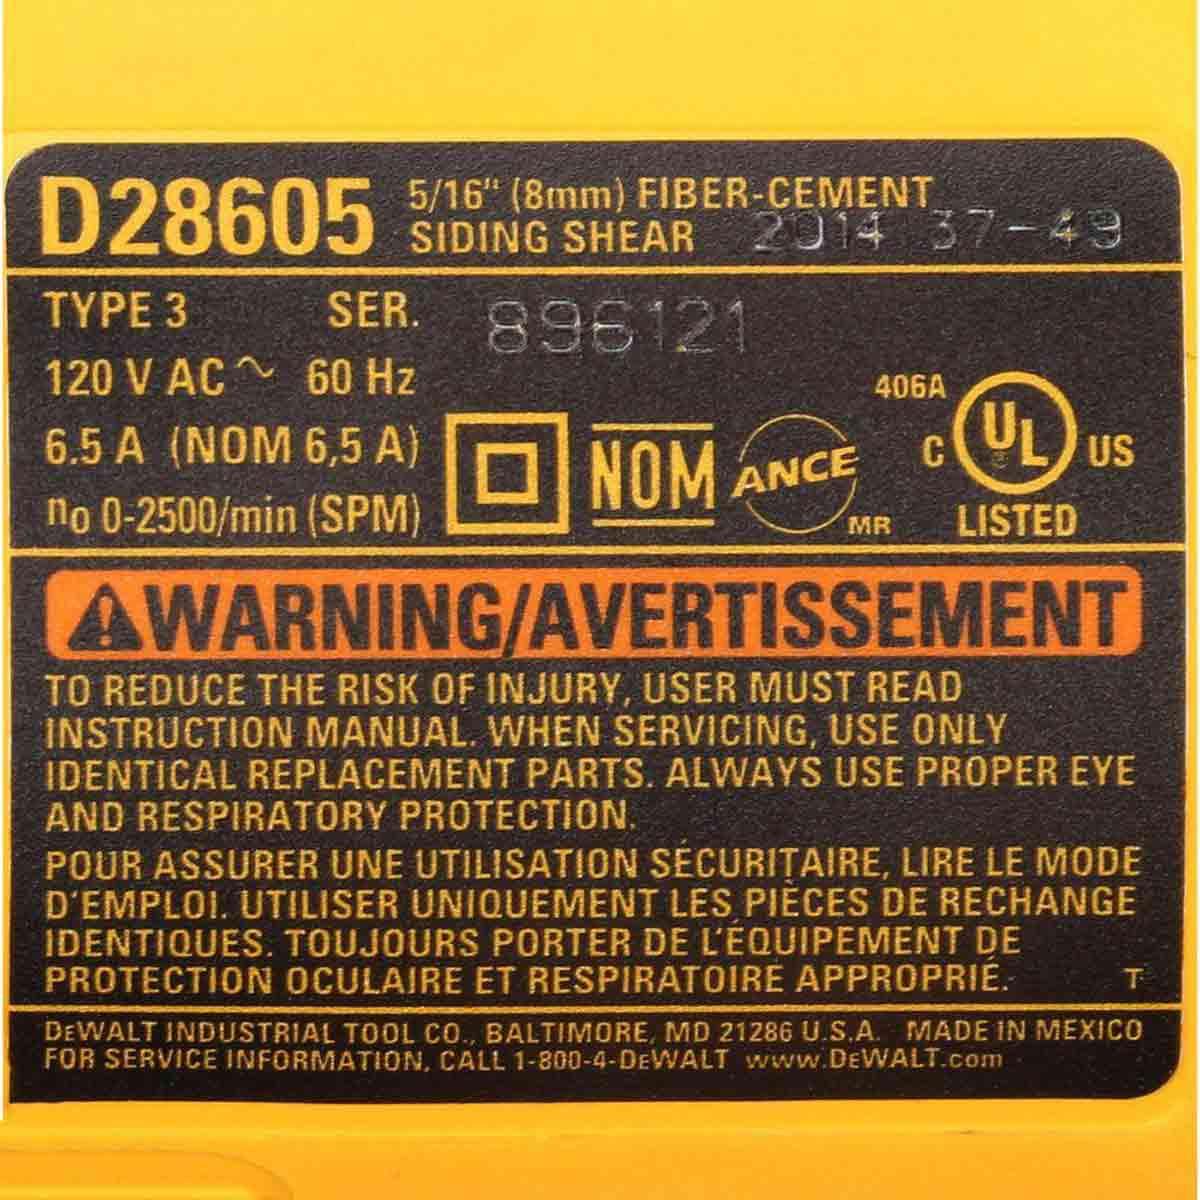 D28605 Dewalt shear motor label